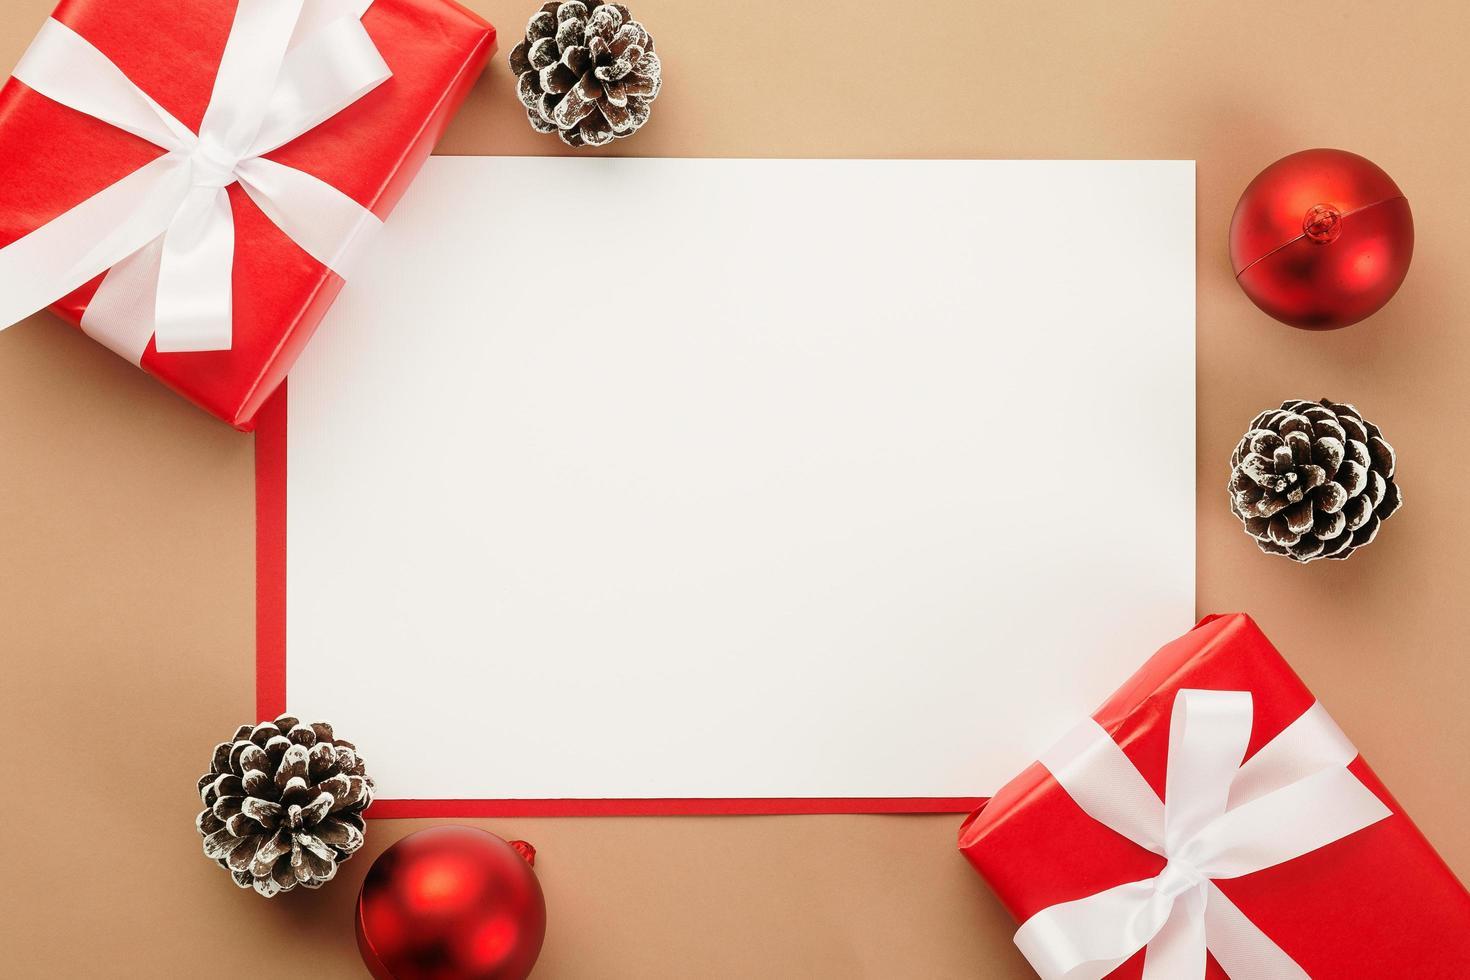 Merry Christmas greeting card mockup photo